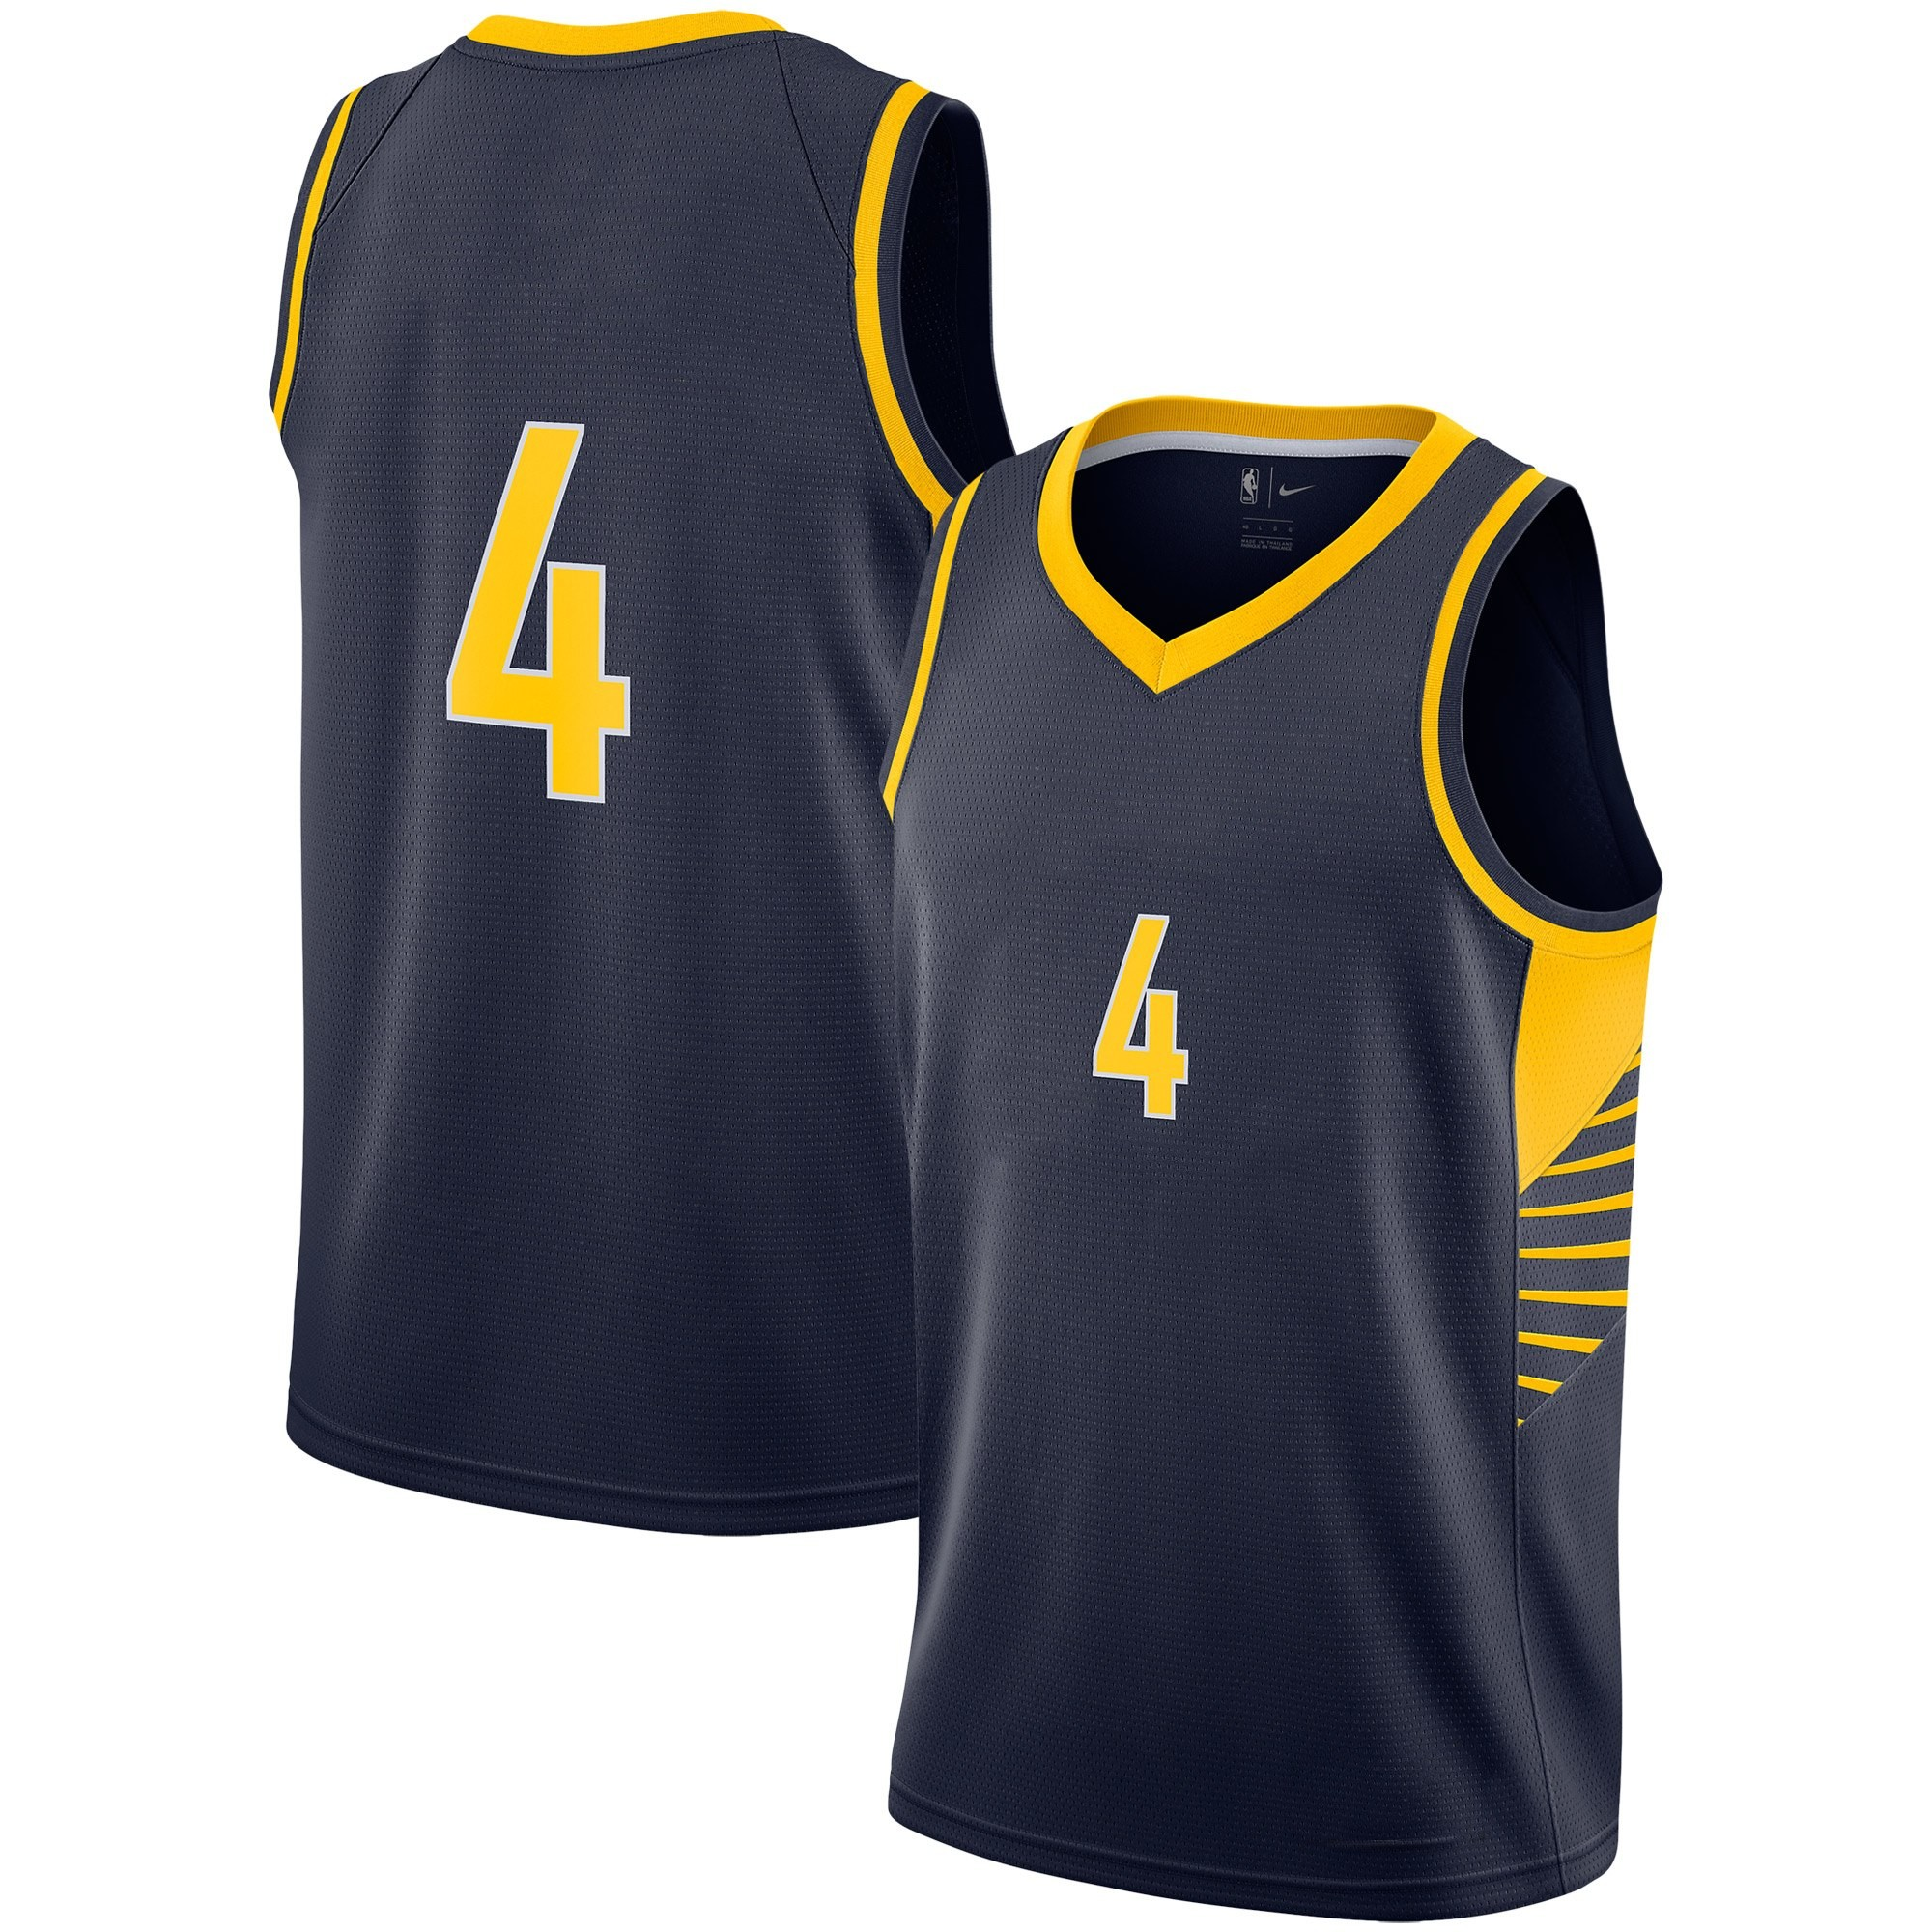 561672d5805 Sublimation custom basketball uniform design / 2018 latest basketball  jerseys